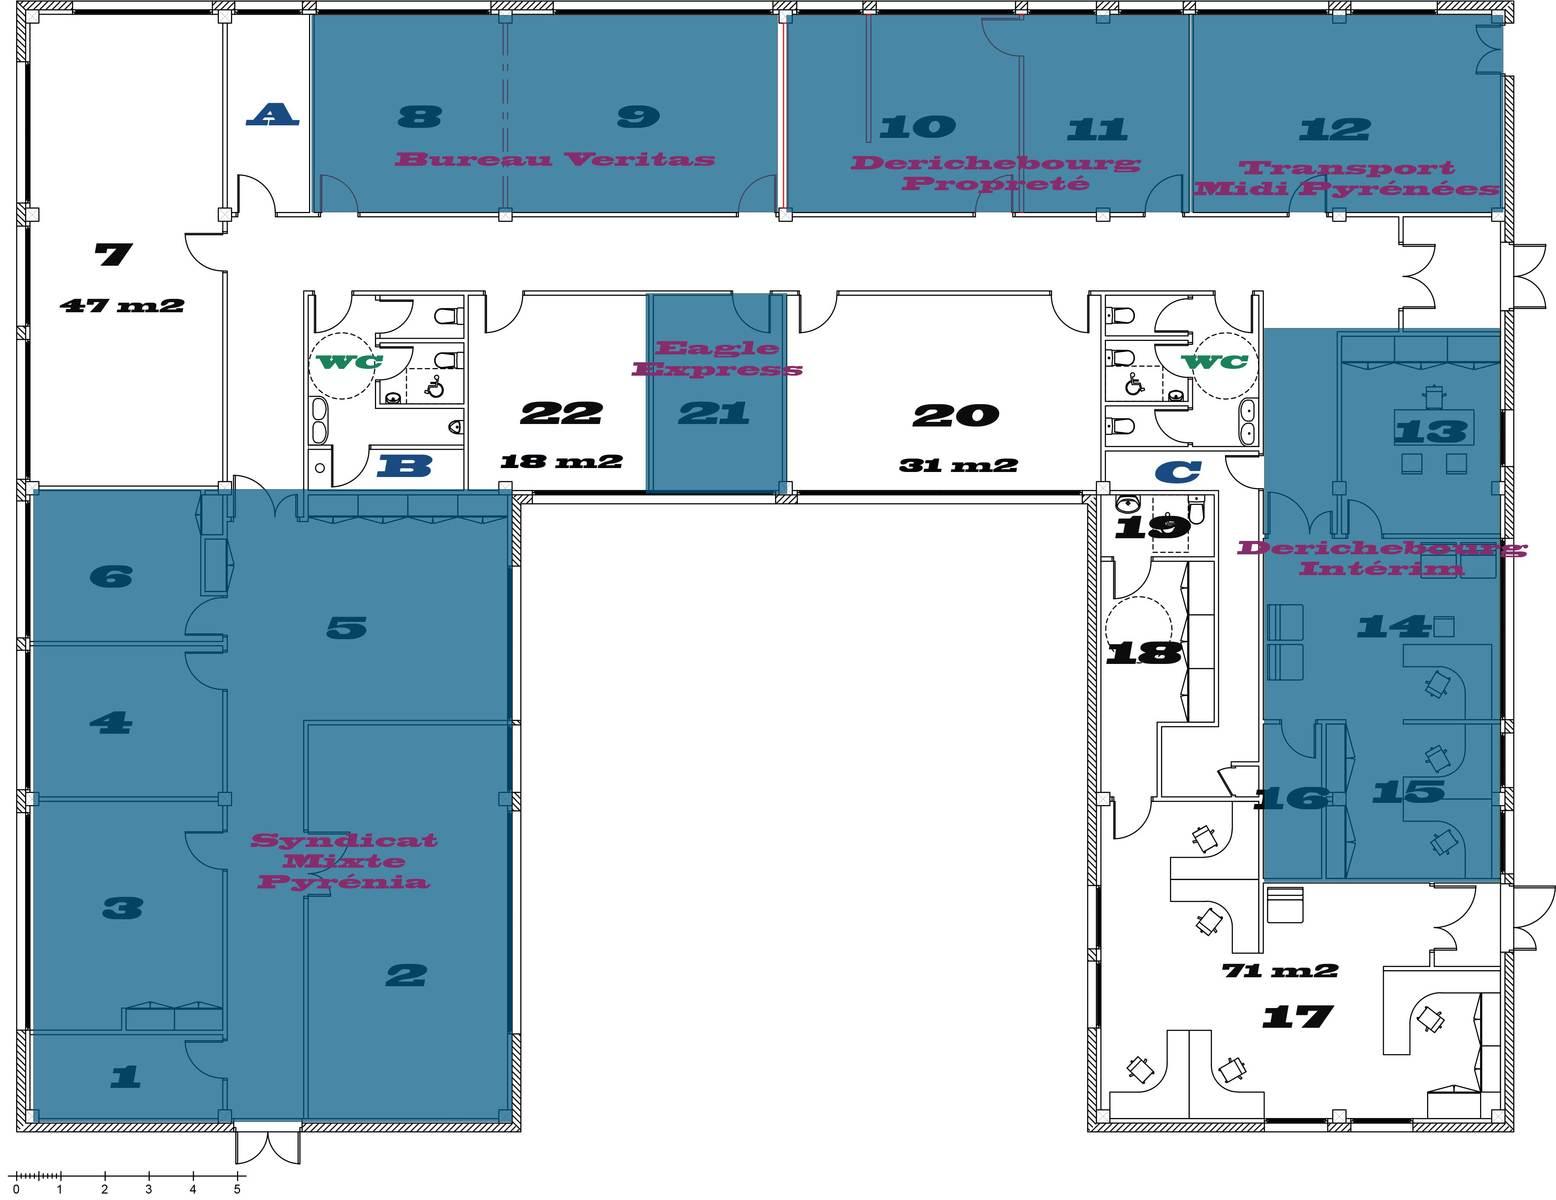 Location a roport de tarbes lourdes pyr n es edeis for Garage du midi plan d orgon